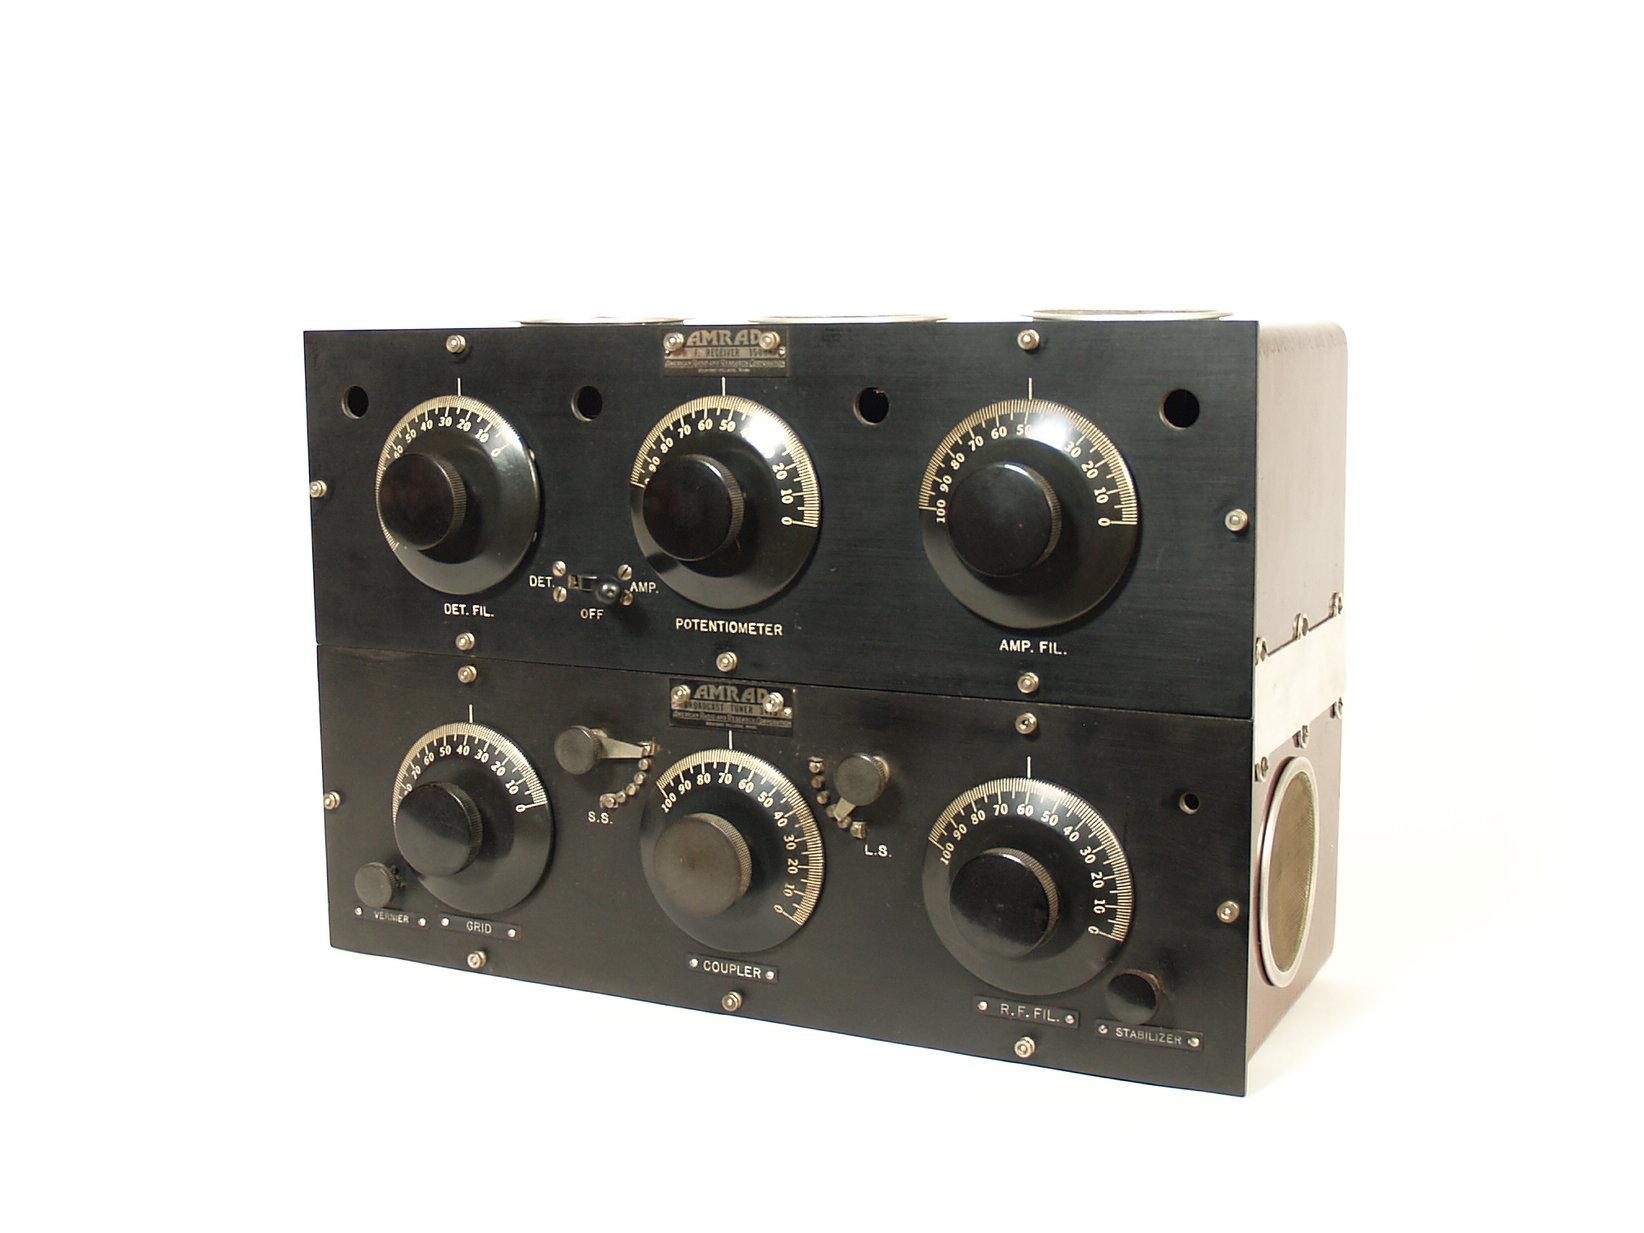 AMRAD 3500-1